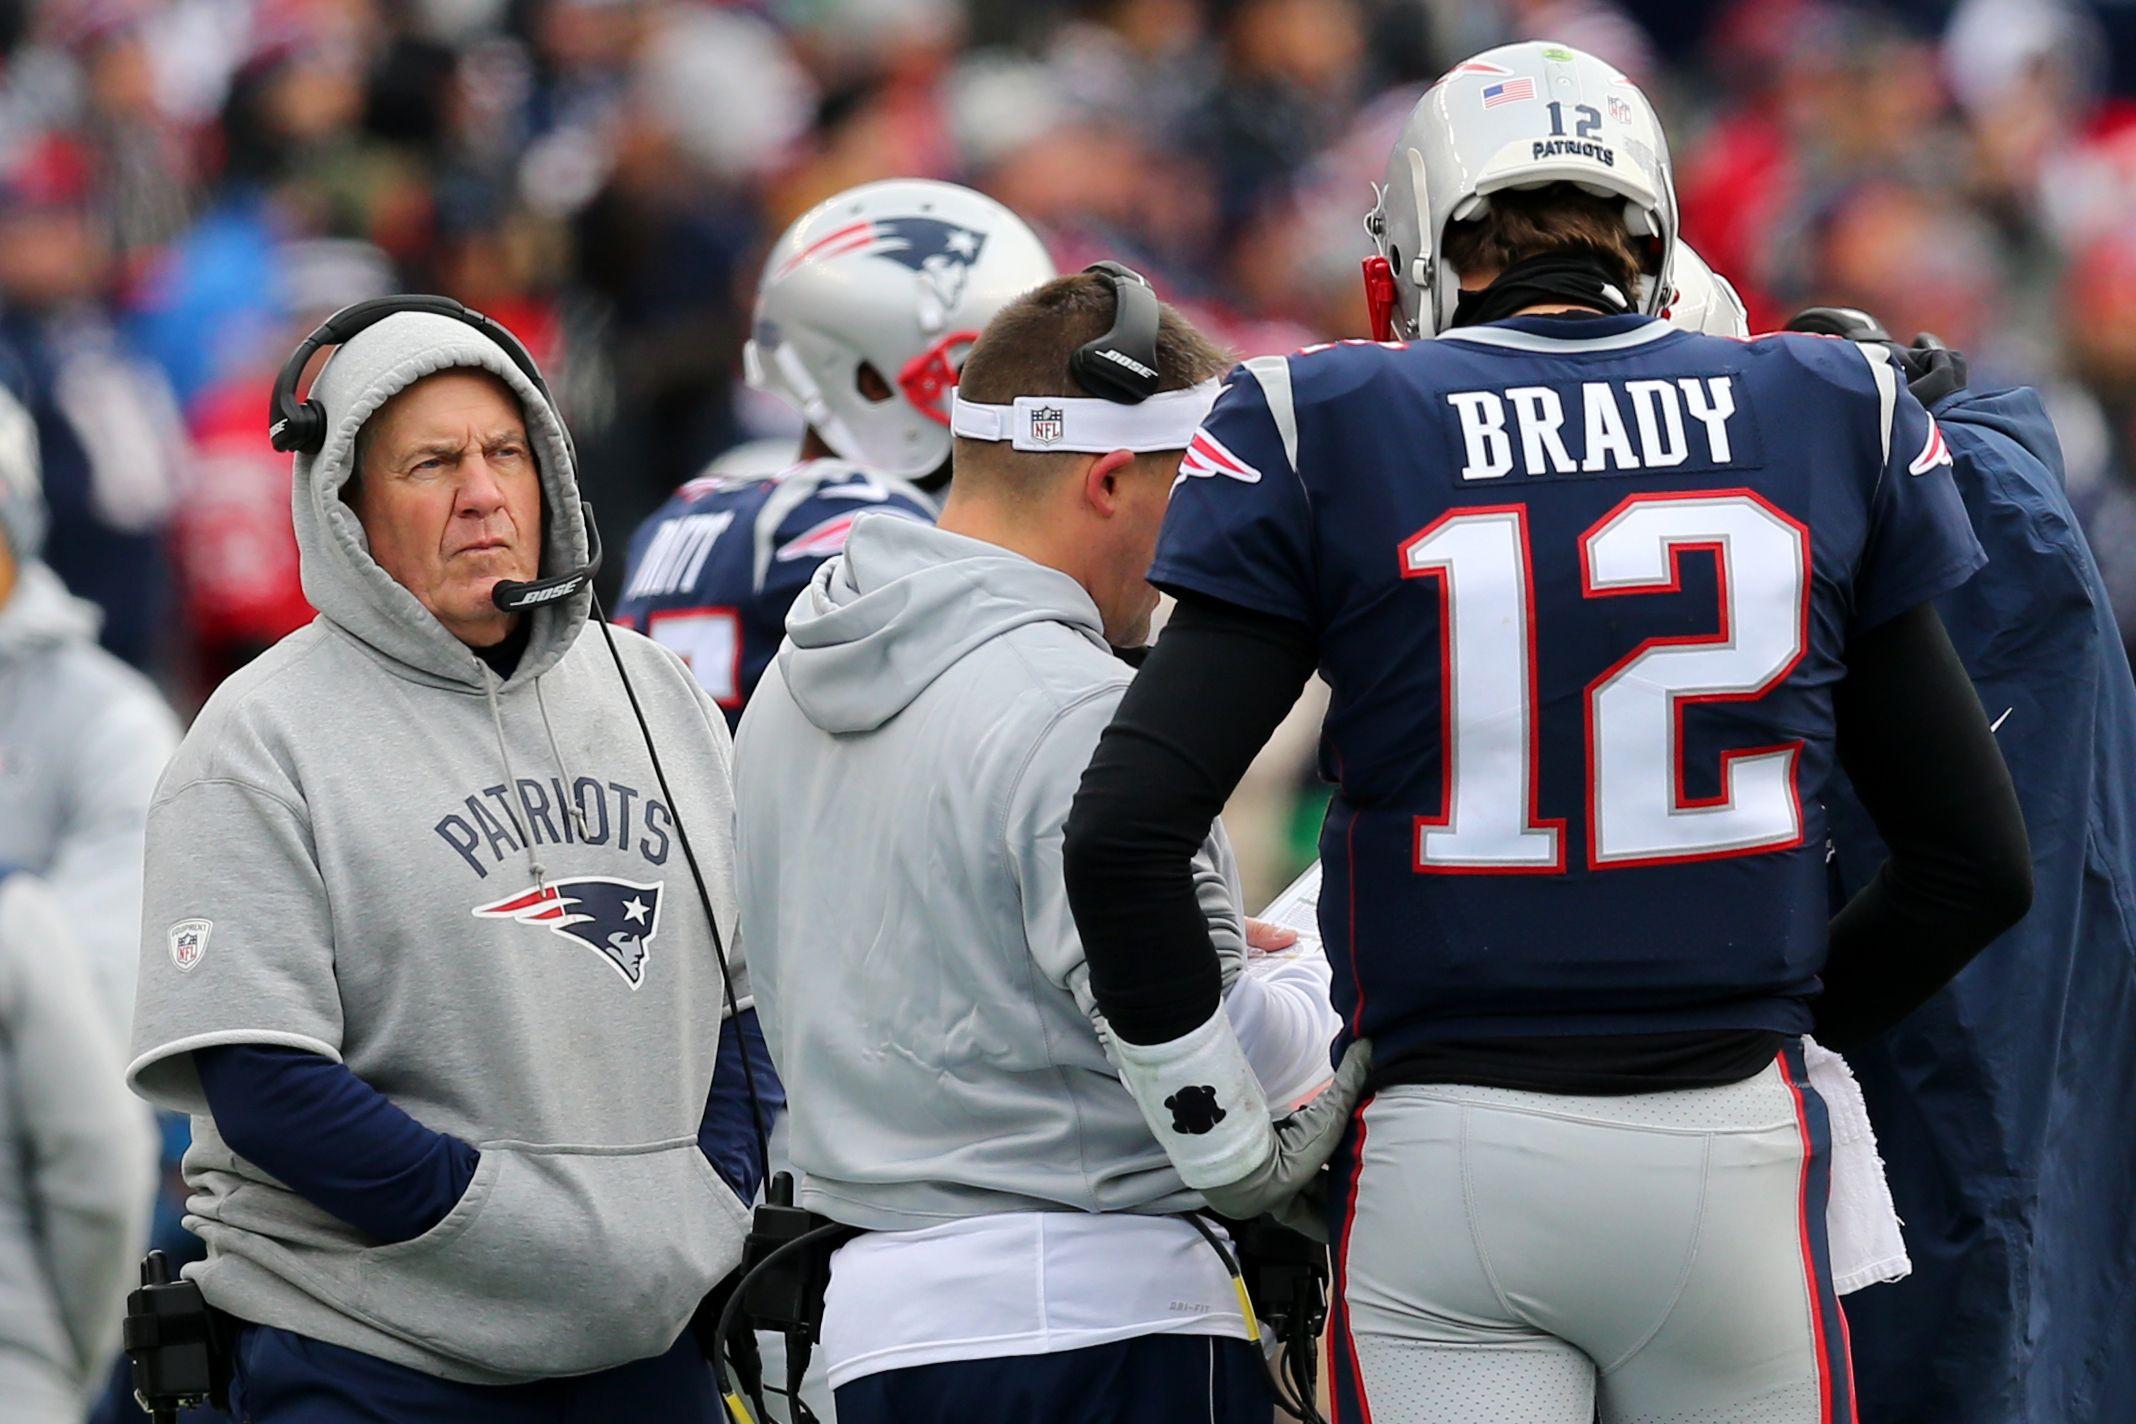 Head coach Bill Belichick of the New England Patriots and Tom Brady at Gillette Stadium, Foxboro, December 24 2017.